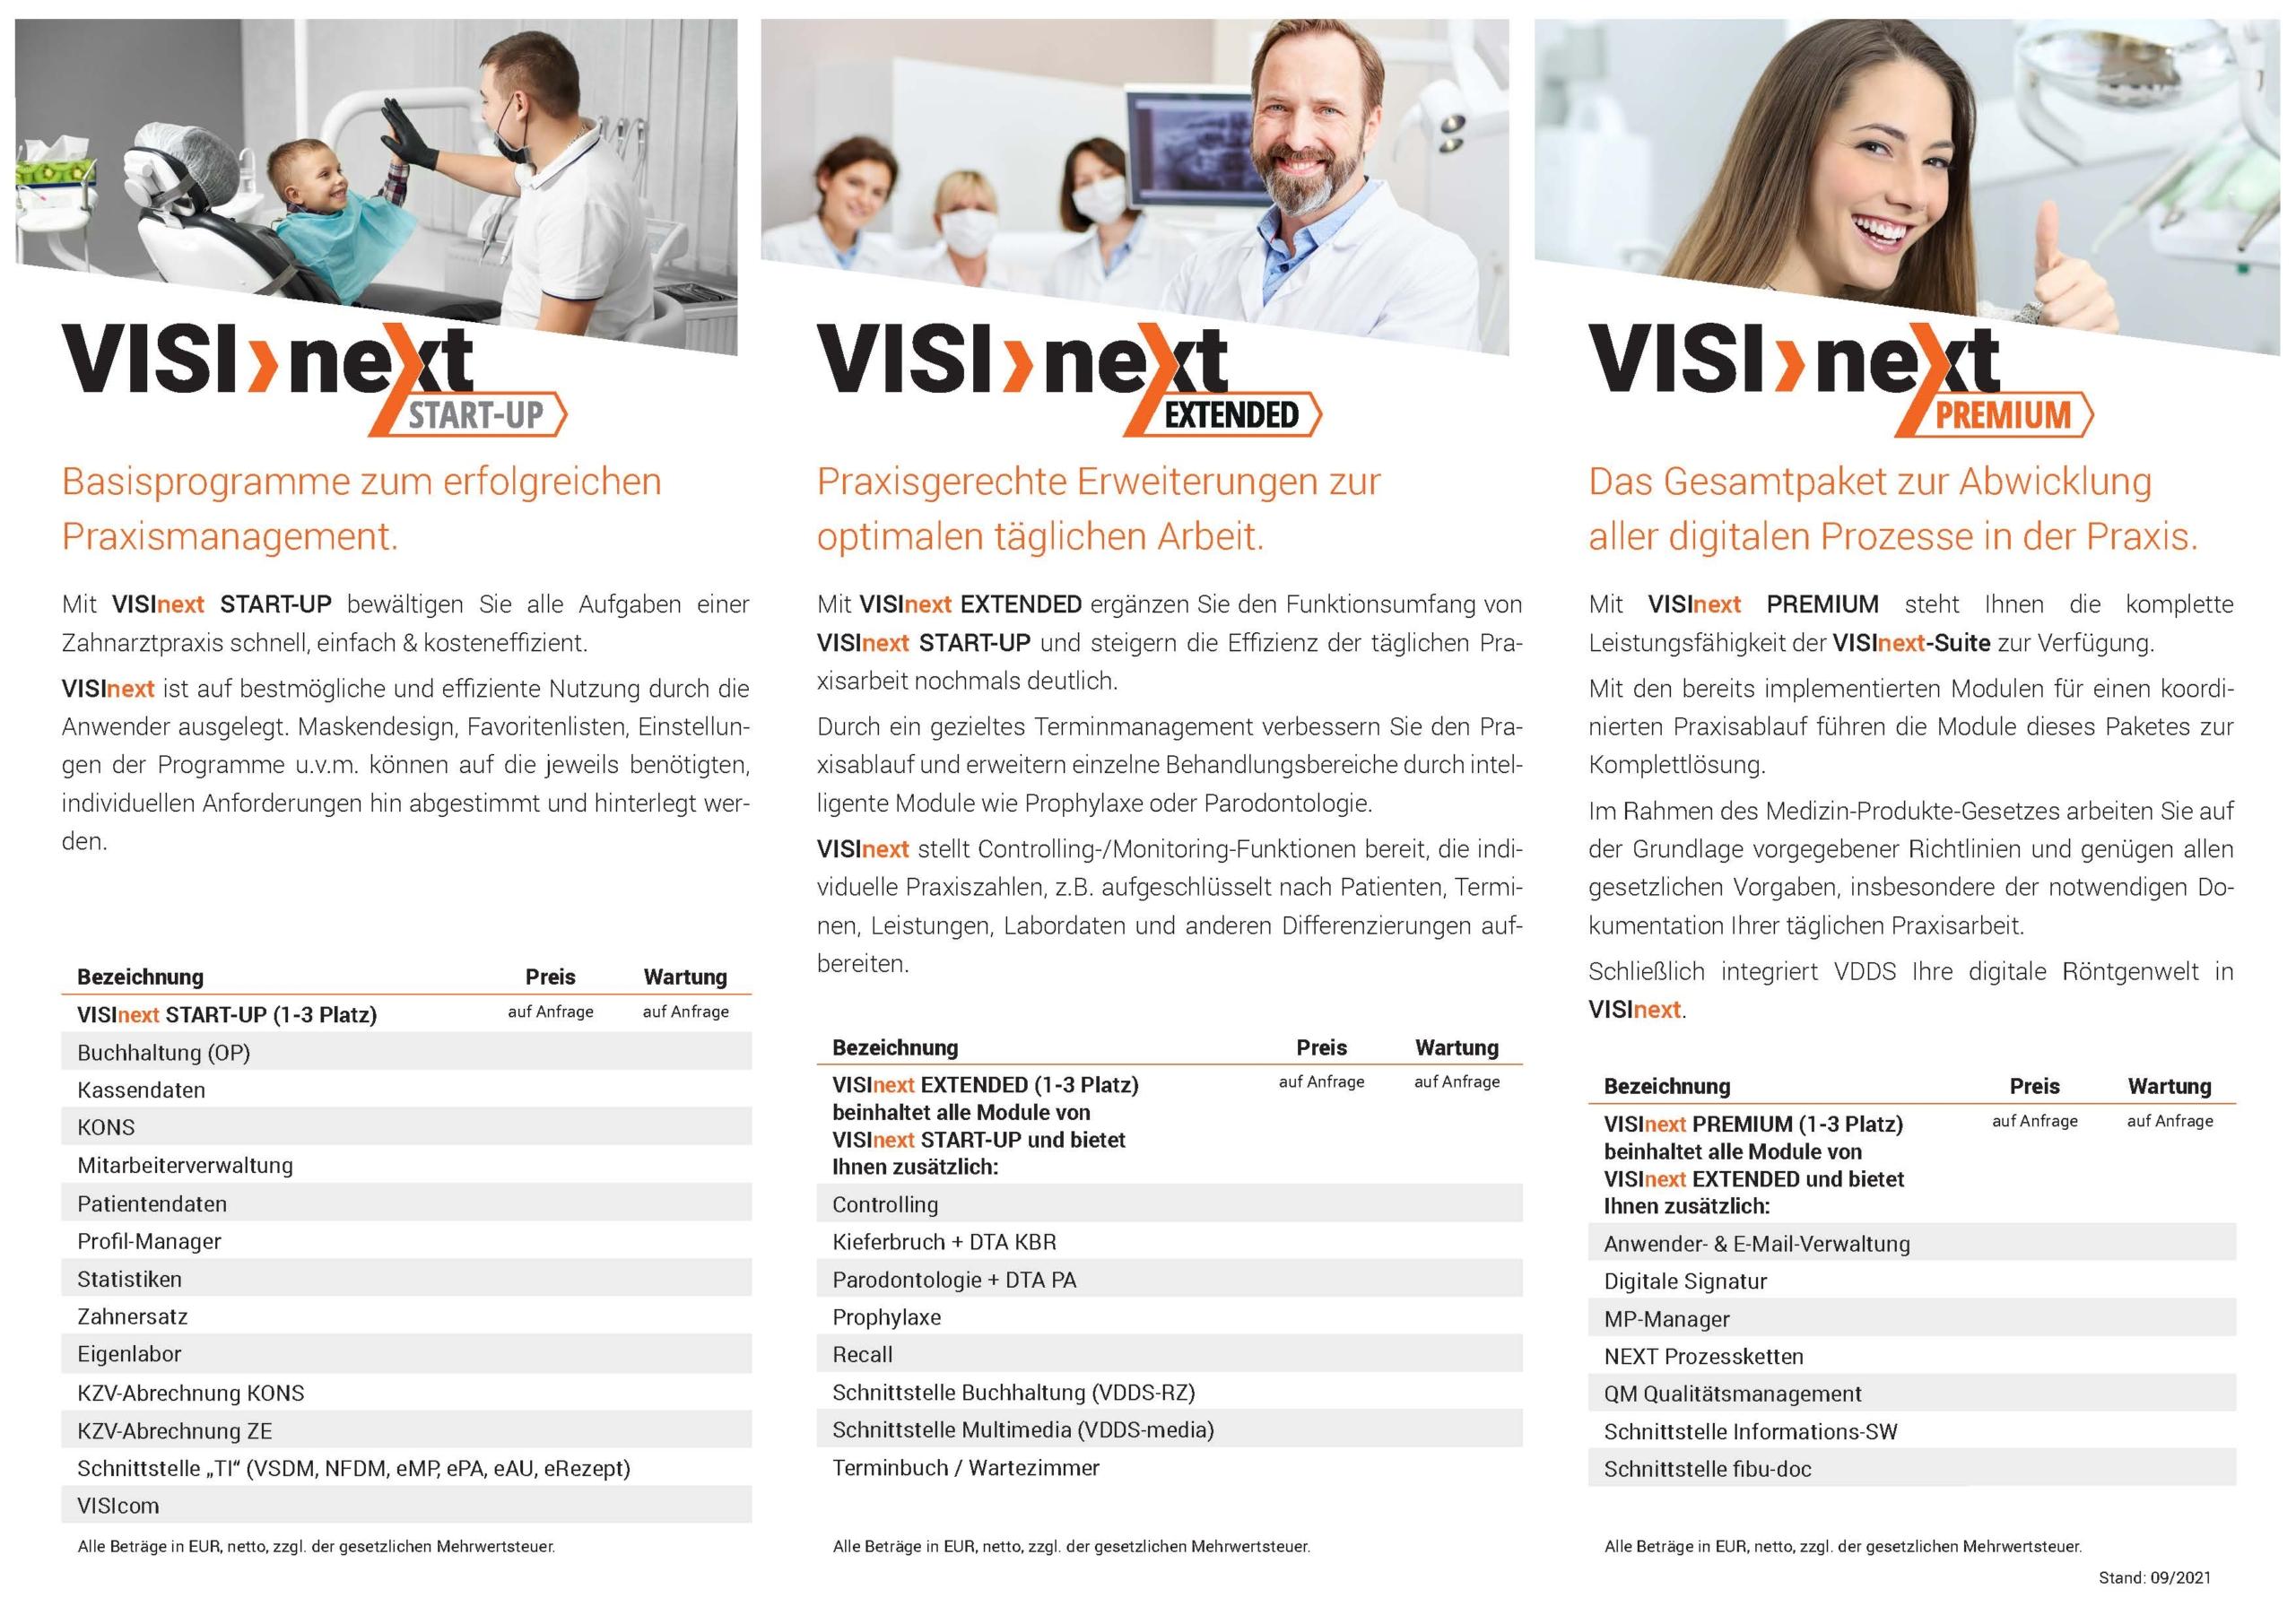 VISInext Flyer - Praxismanagement-Software